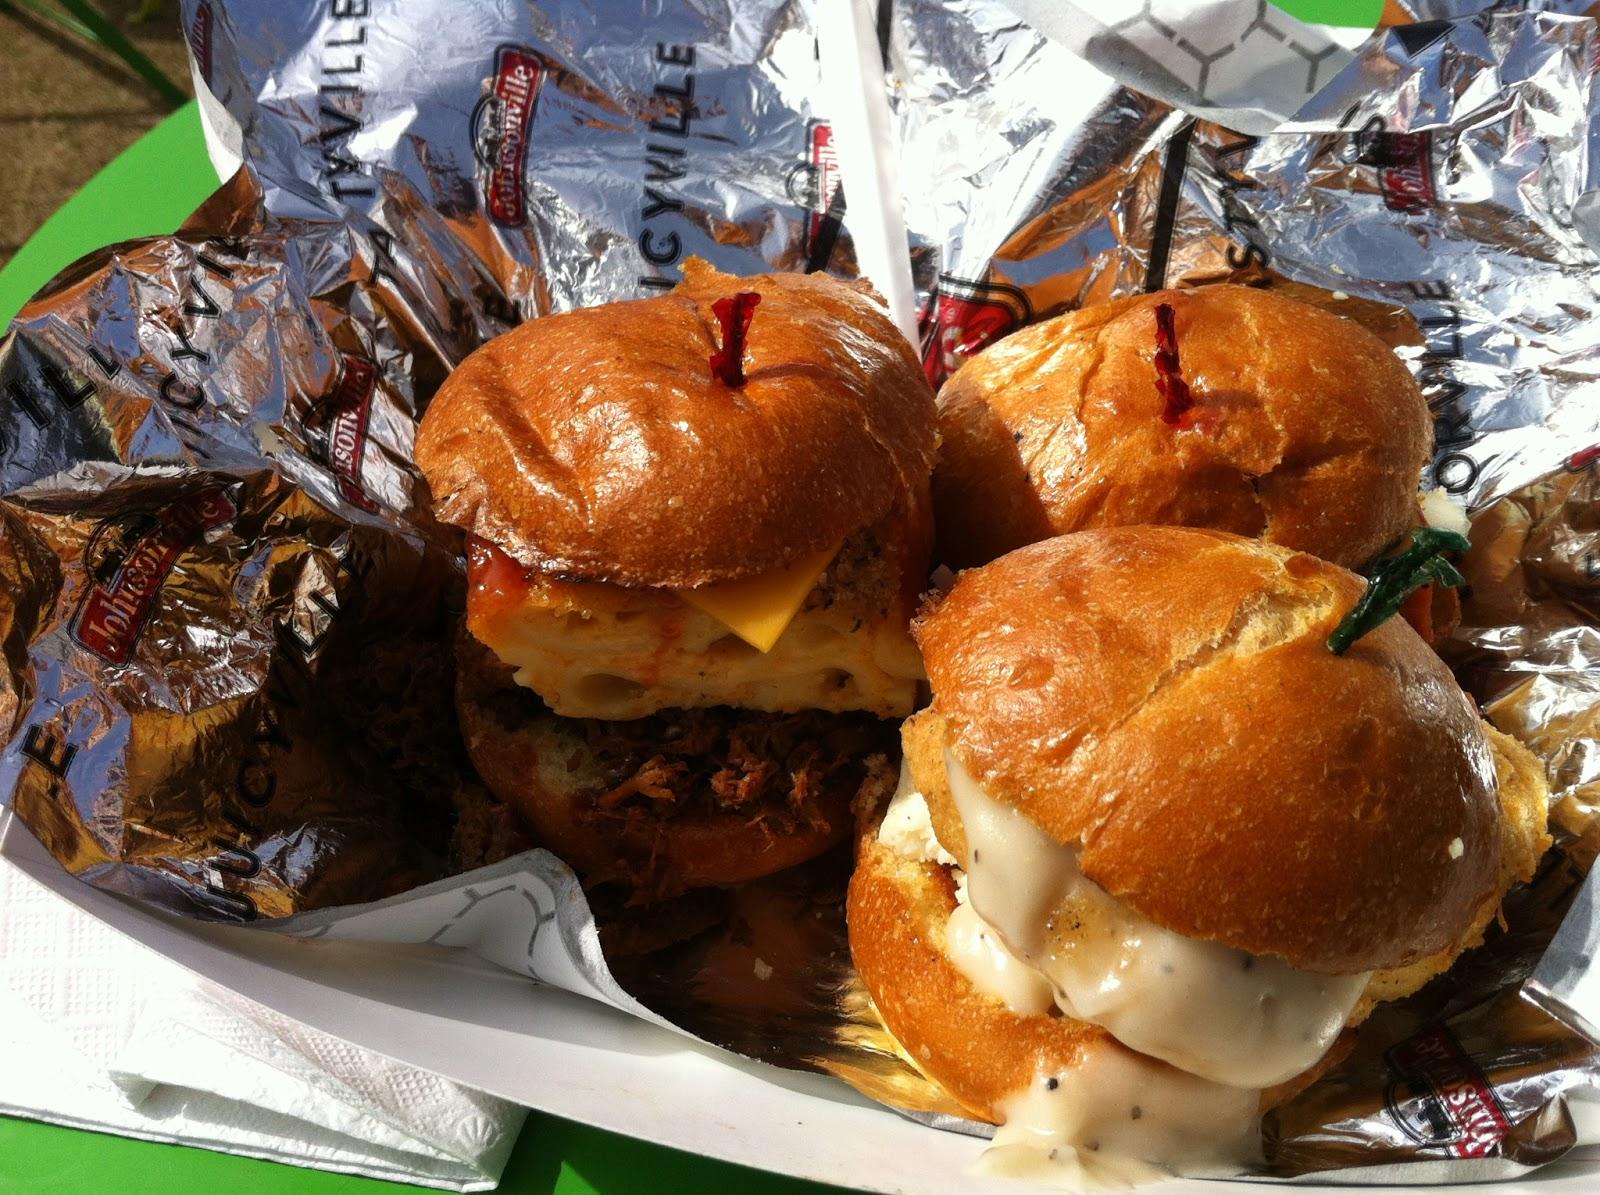 Butcher Son Dallas BBQ Barbecue Barbeque Bar-B-Que Food Truck Sliders Sandwich